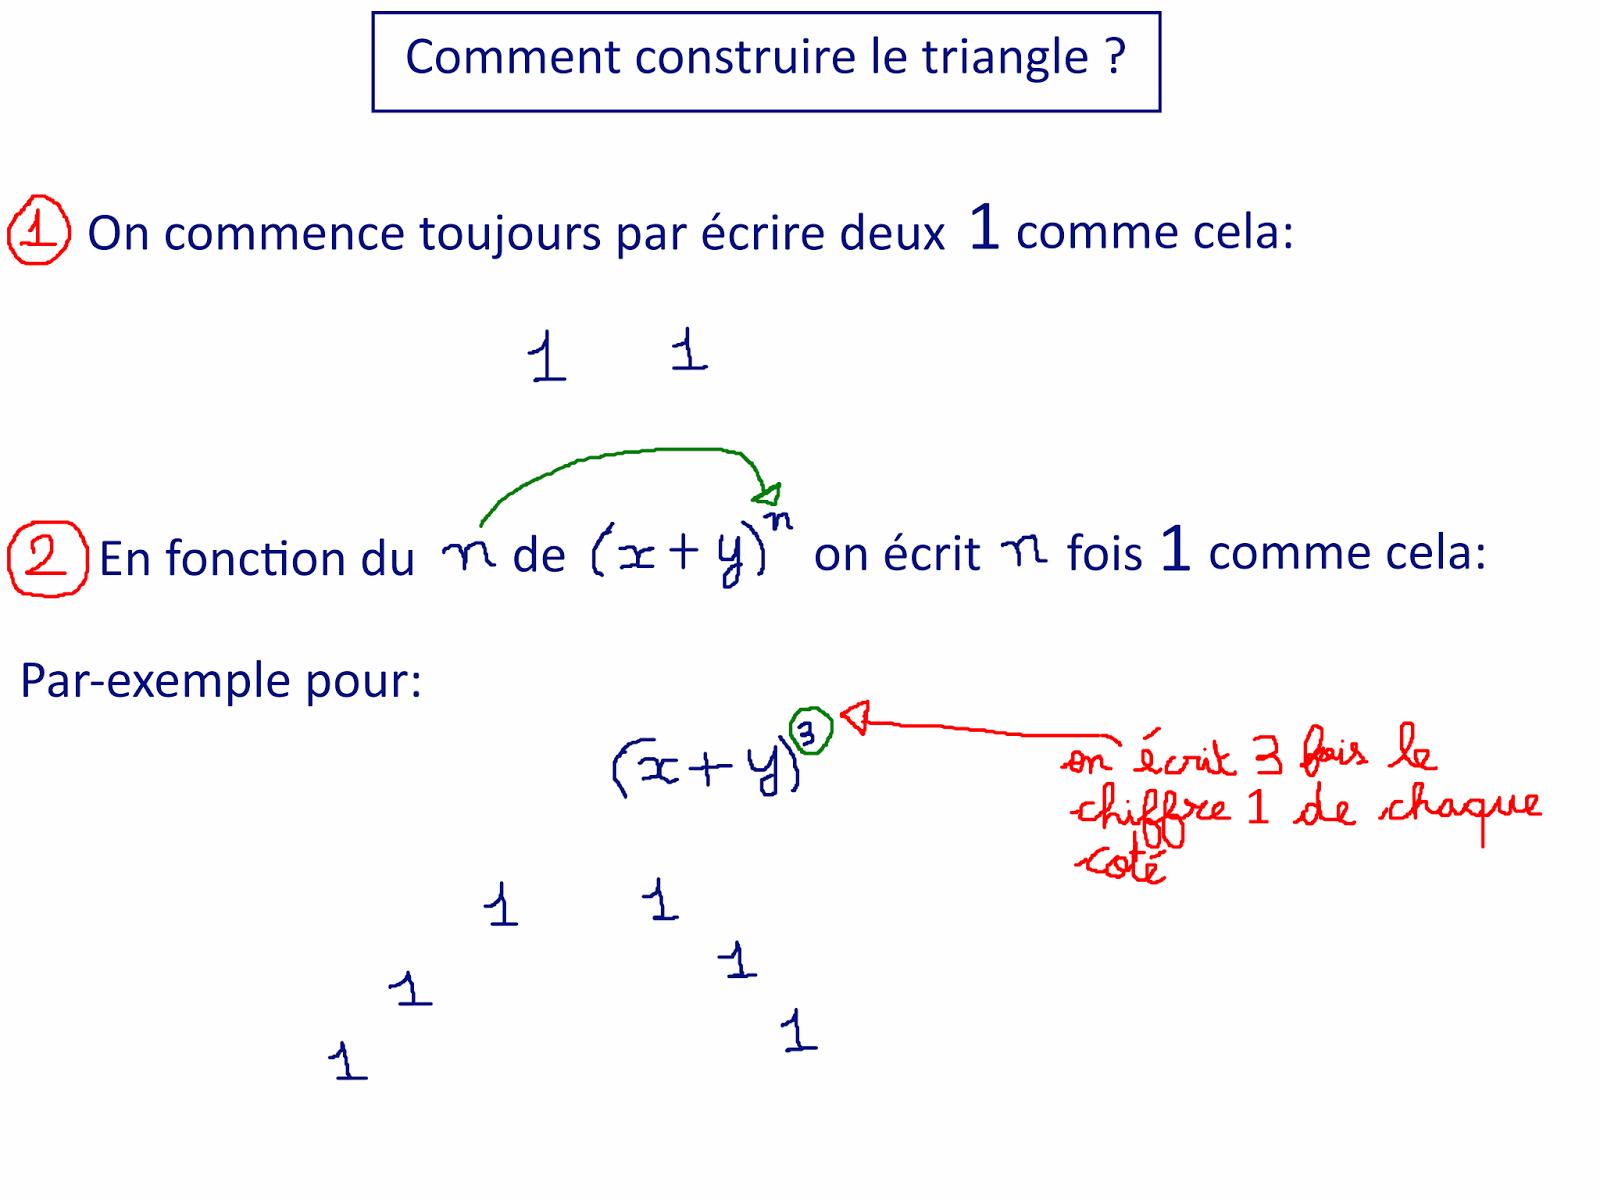 book домашняя работа по физике за 8